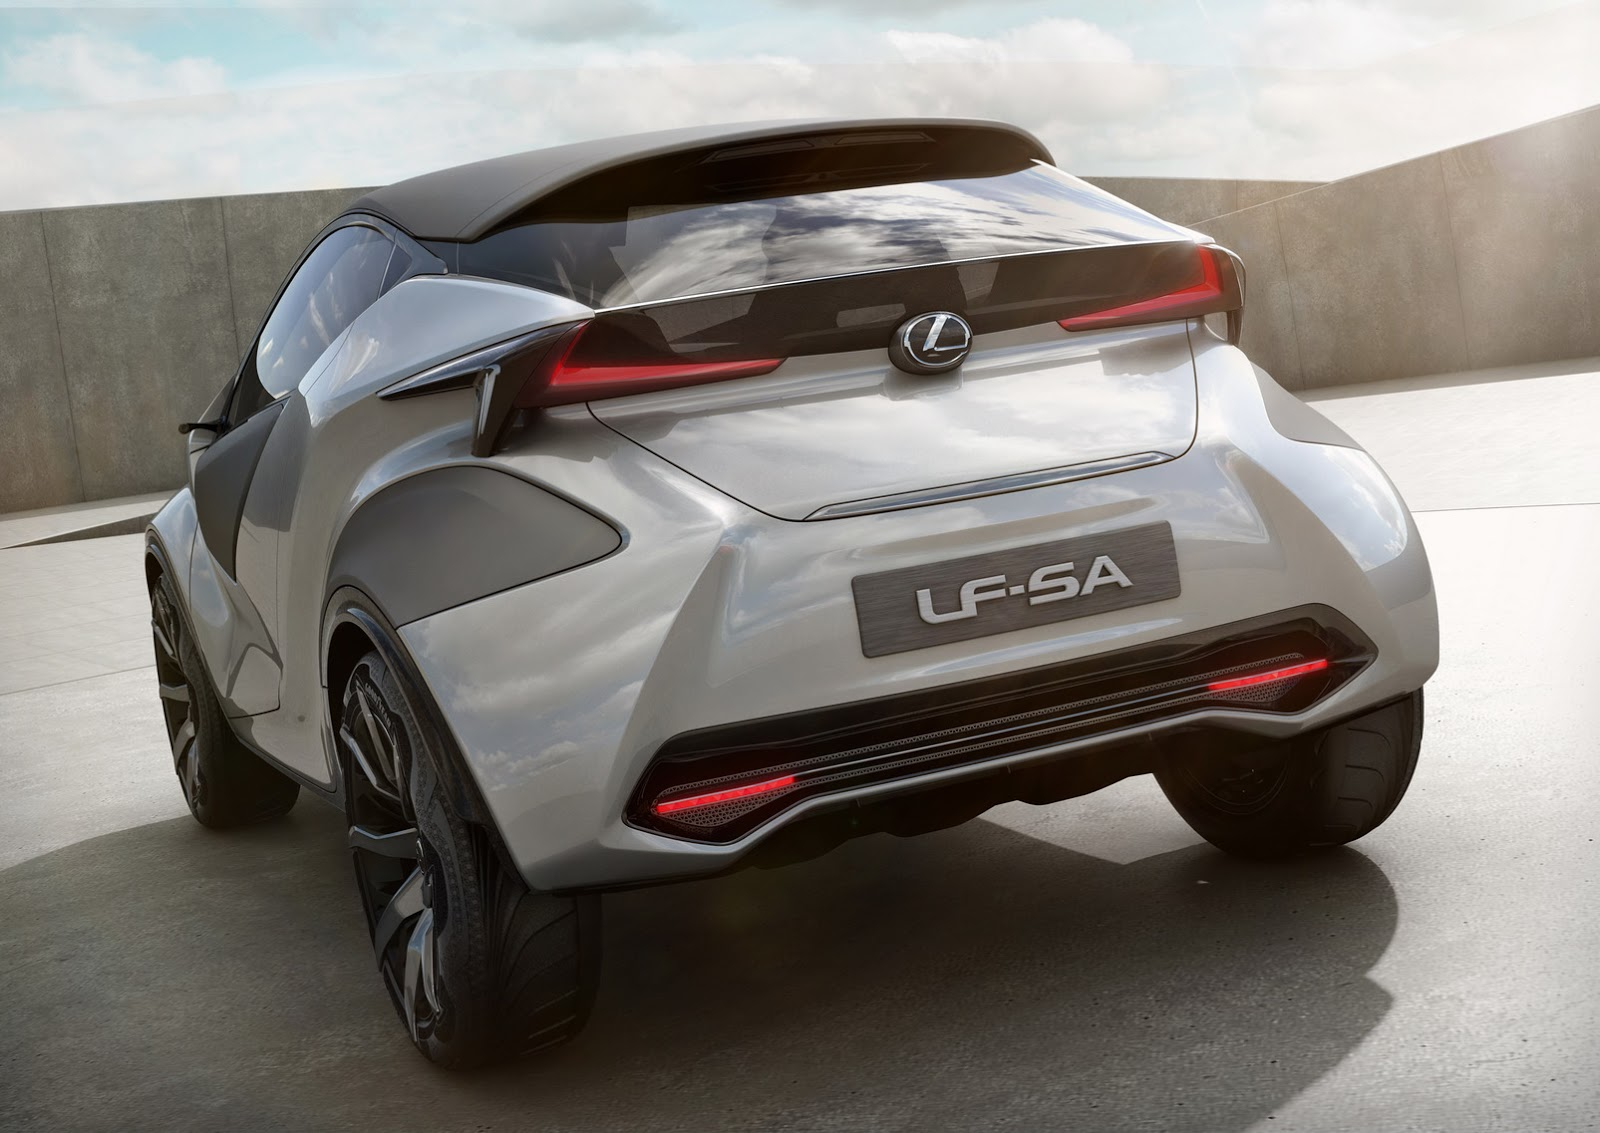 Lexus-LF-SA-Concept-4.jpeg